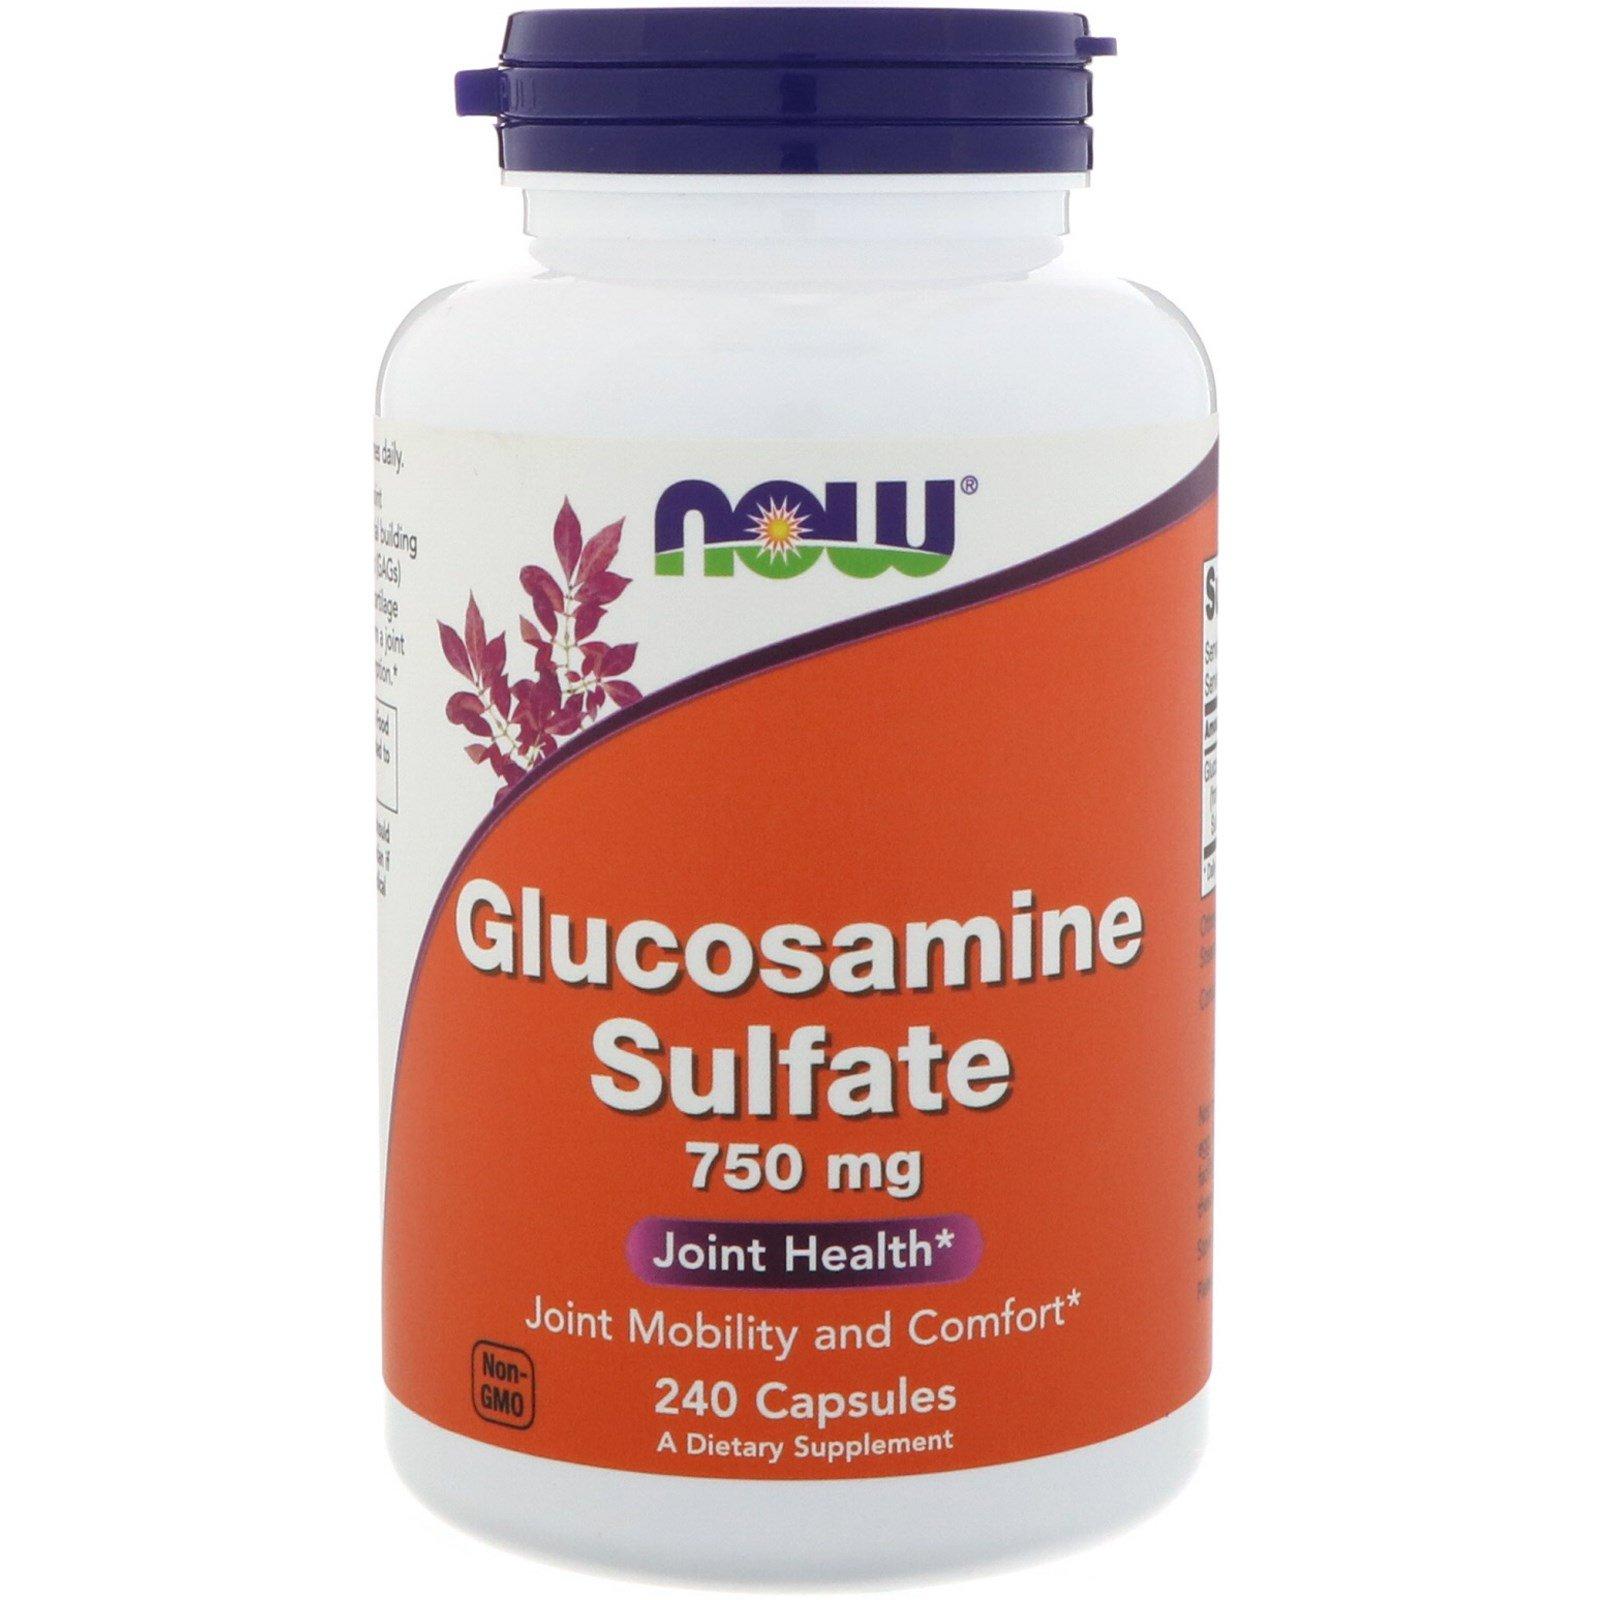 NOW Glucosamine Sulfate 750mg